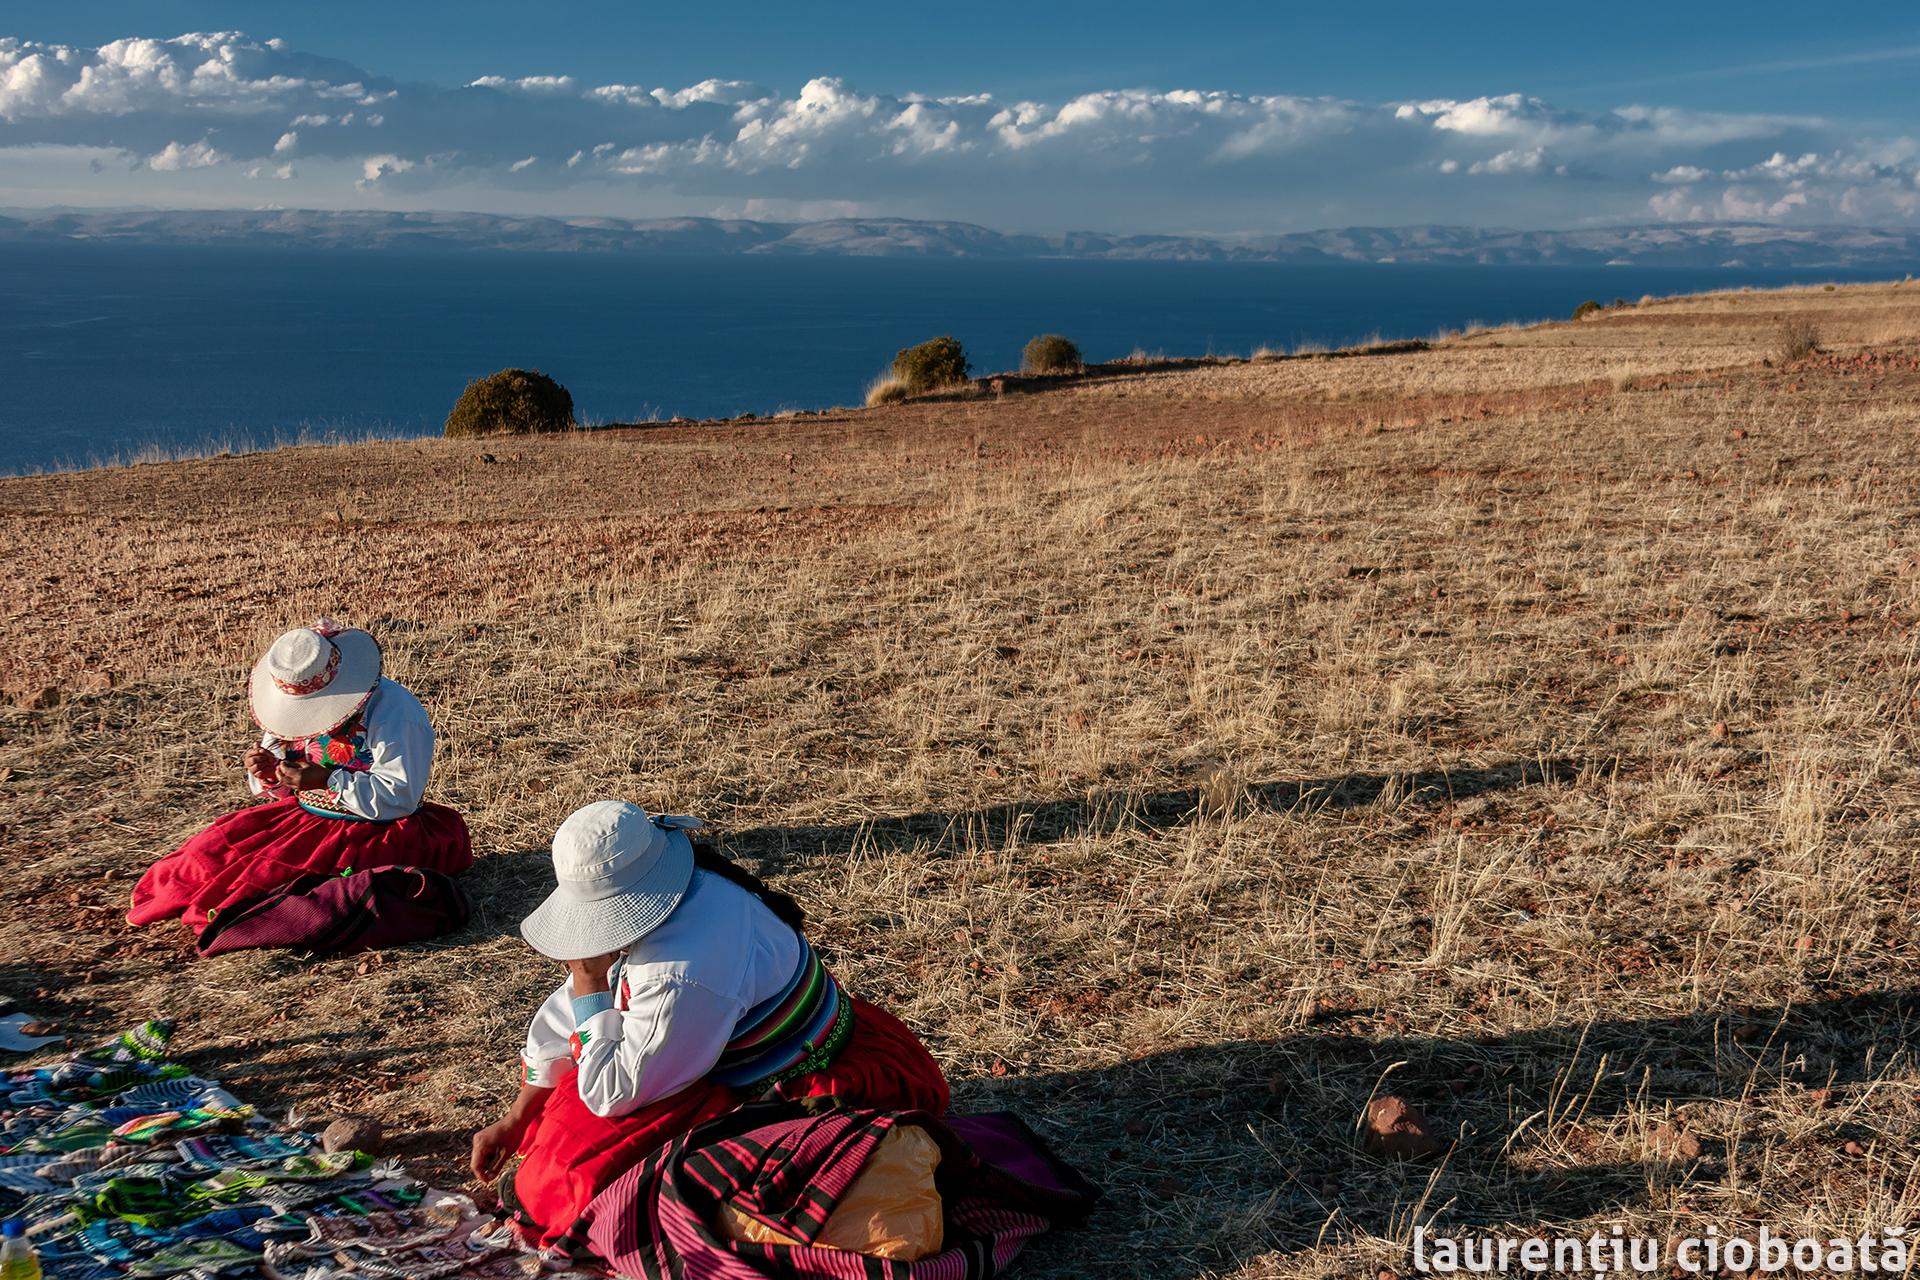 034_TiticacaLAU_0016